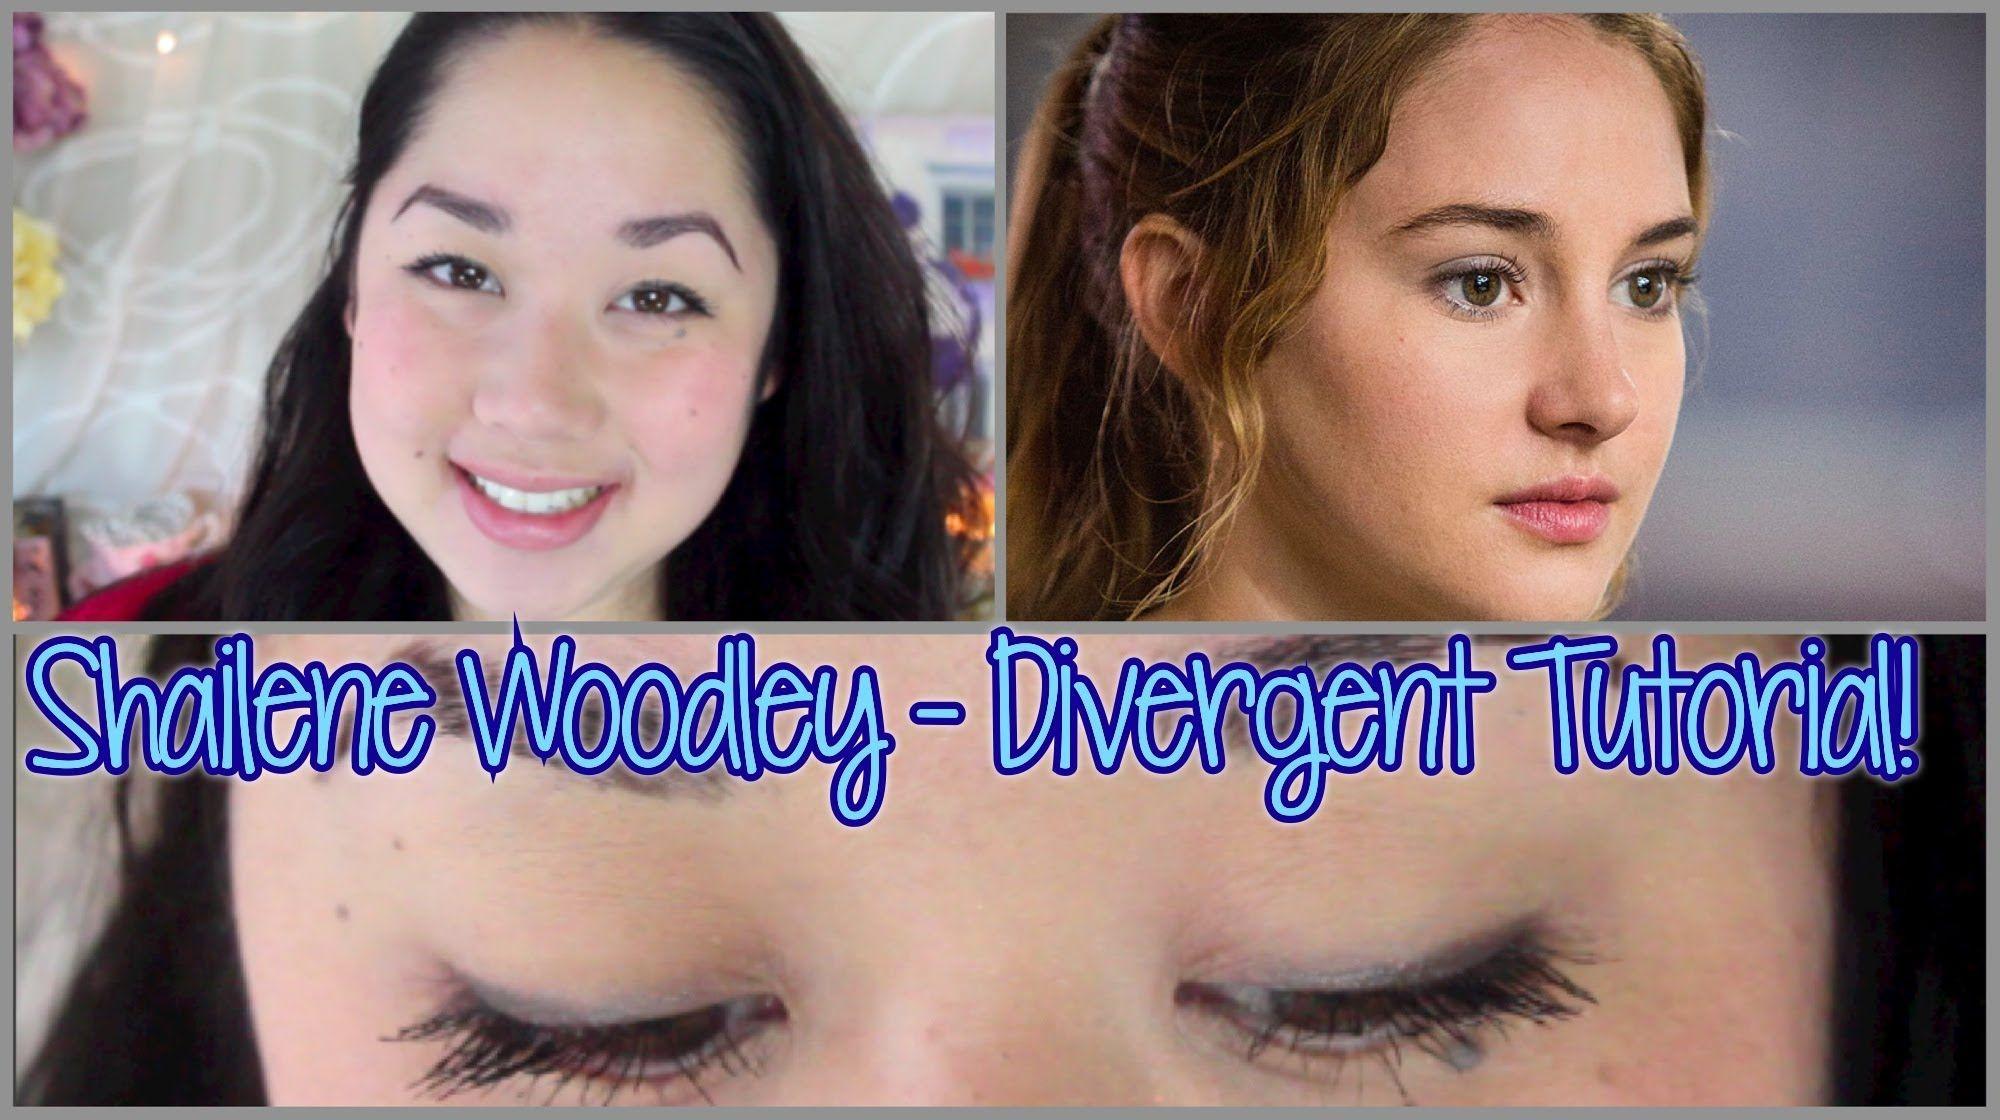 Divergent Tutorial - Shailene Woodley! (Neutral Everyday Makeup)